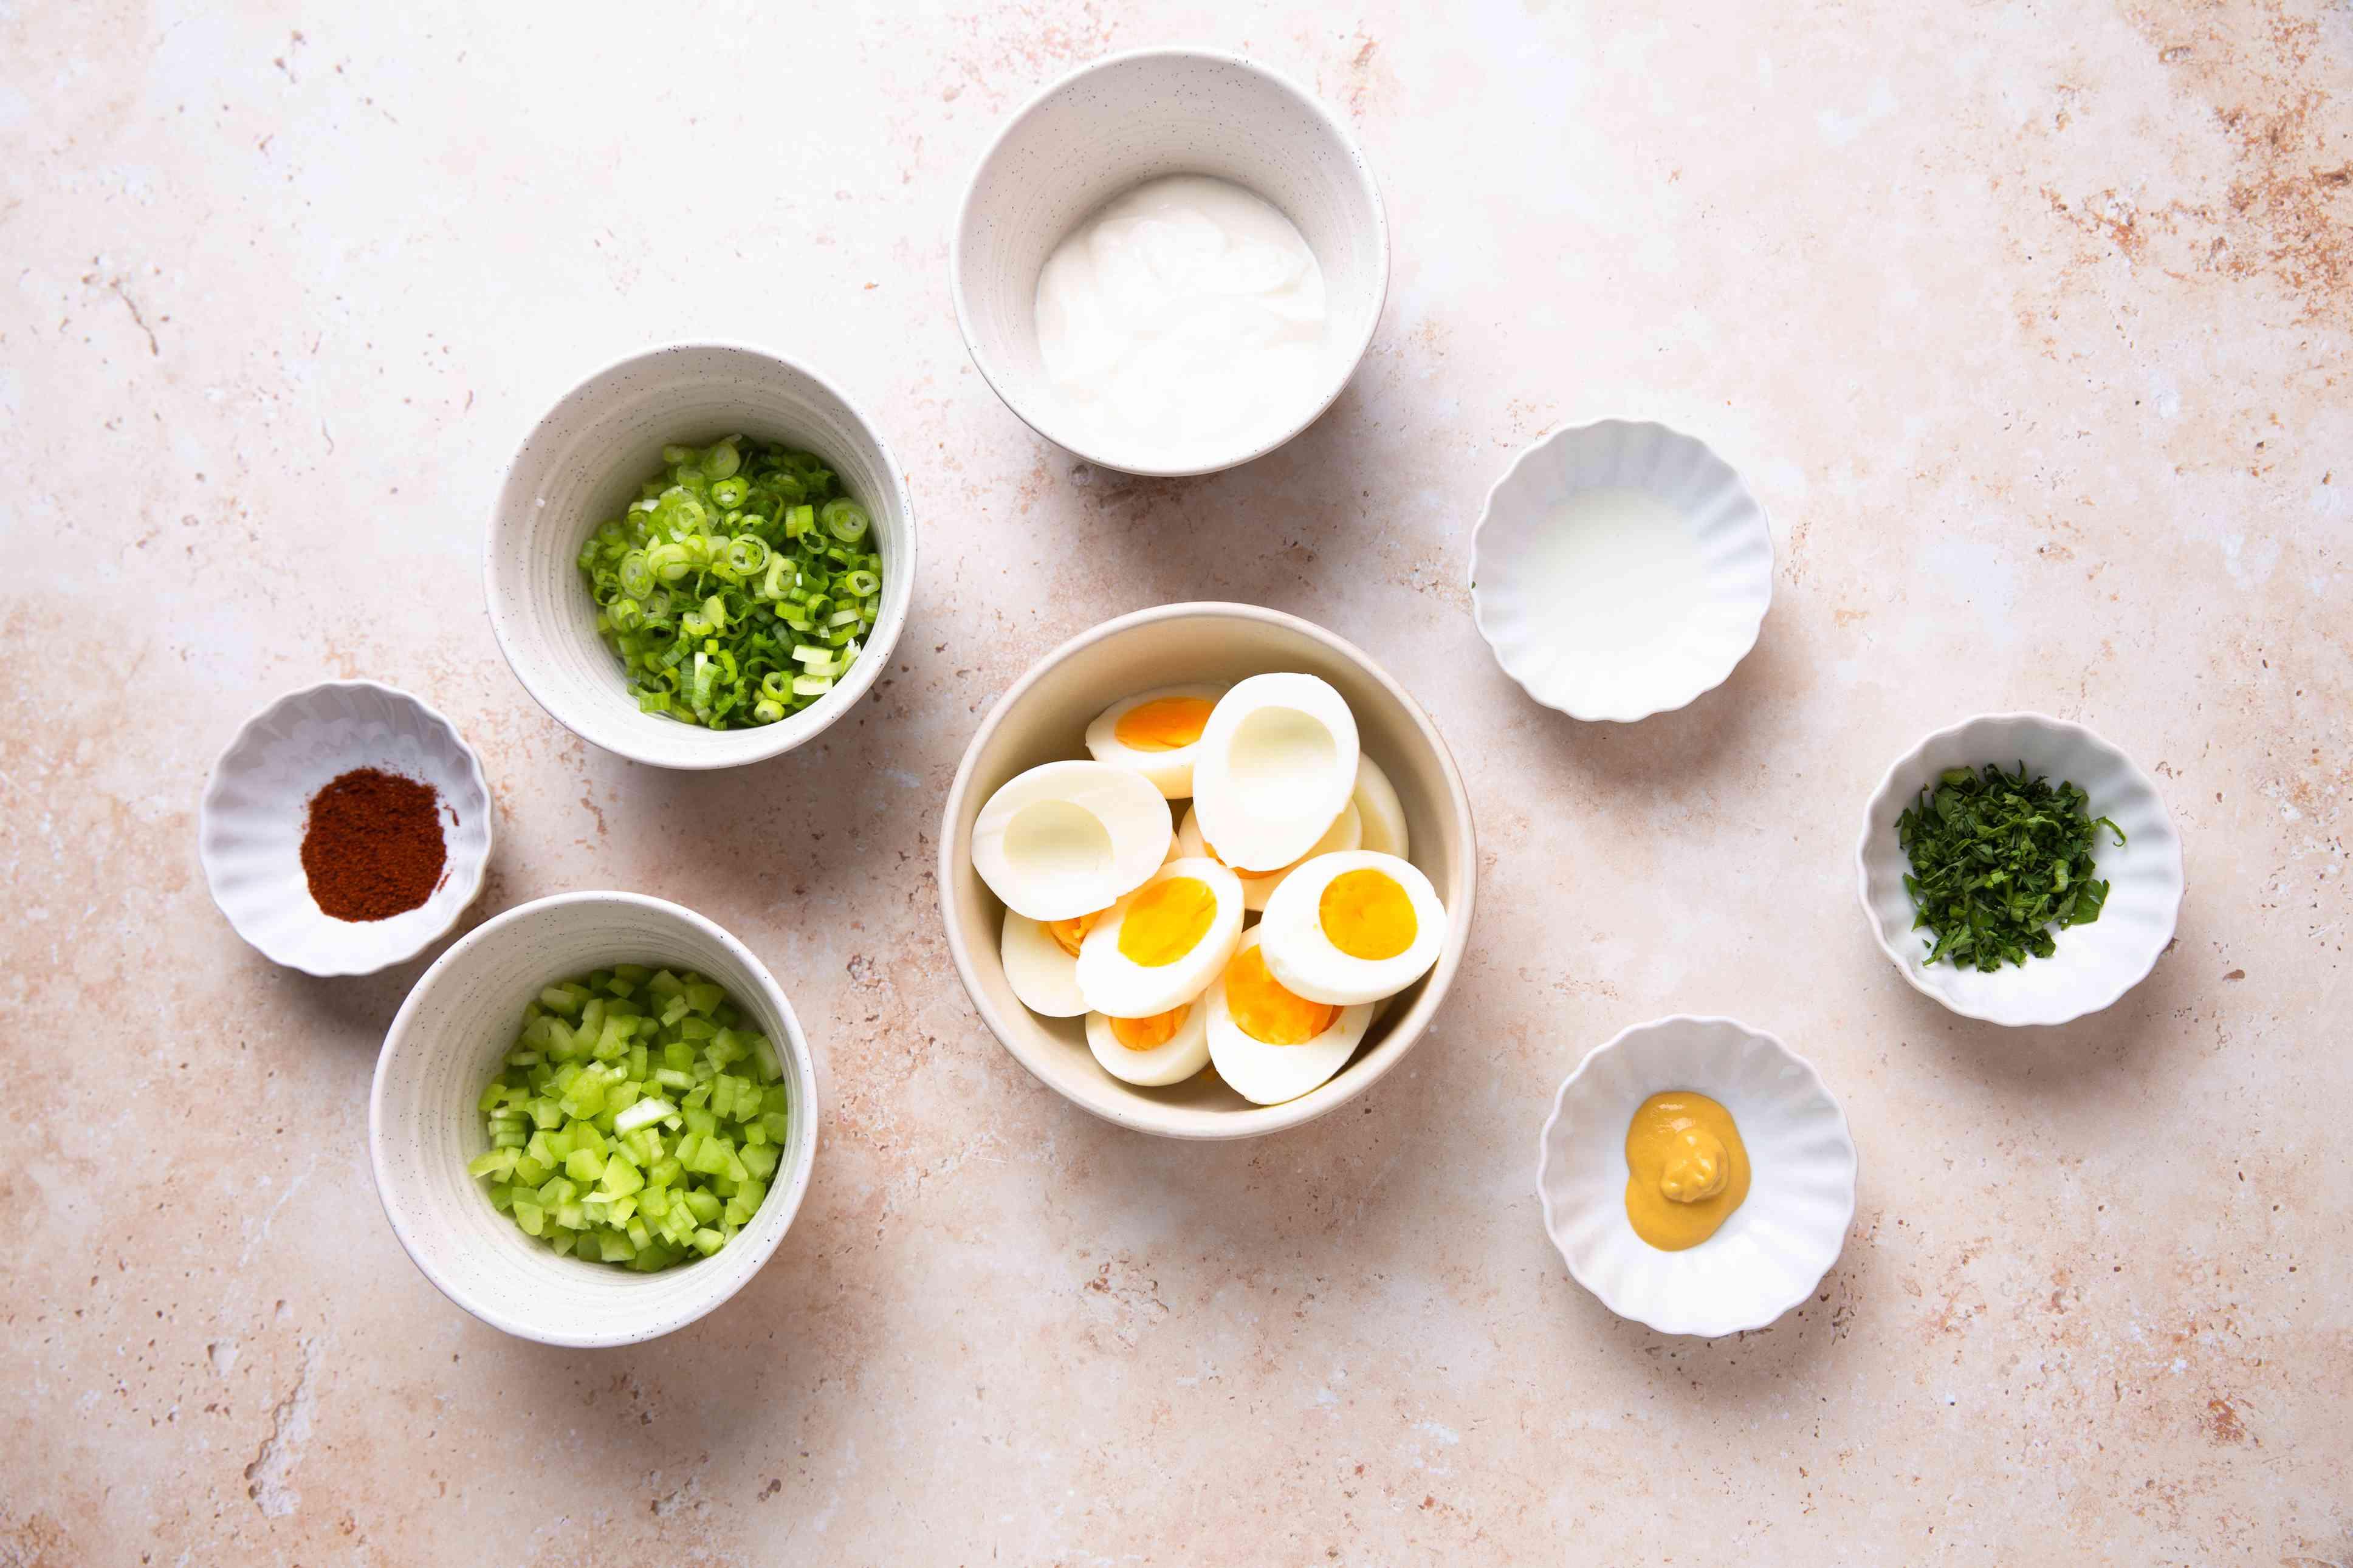 Creamy Egg Salad (Without Mayo) ingredients